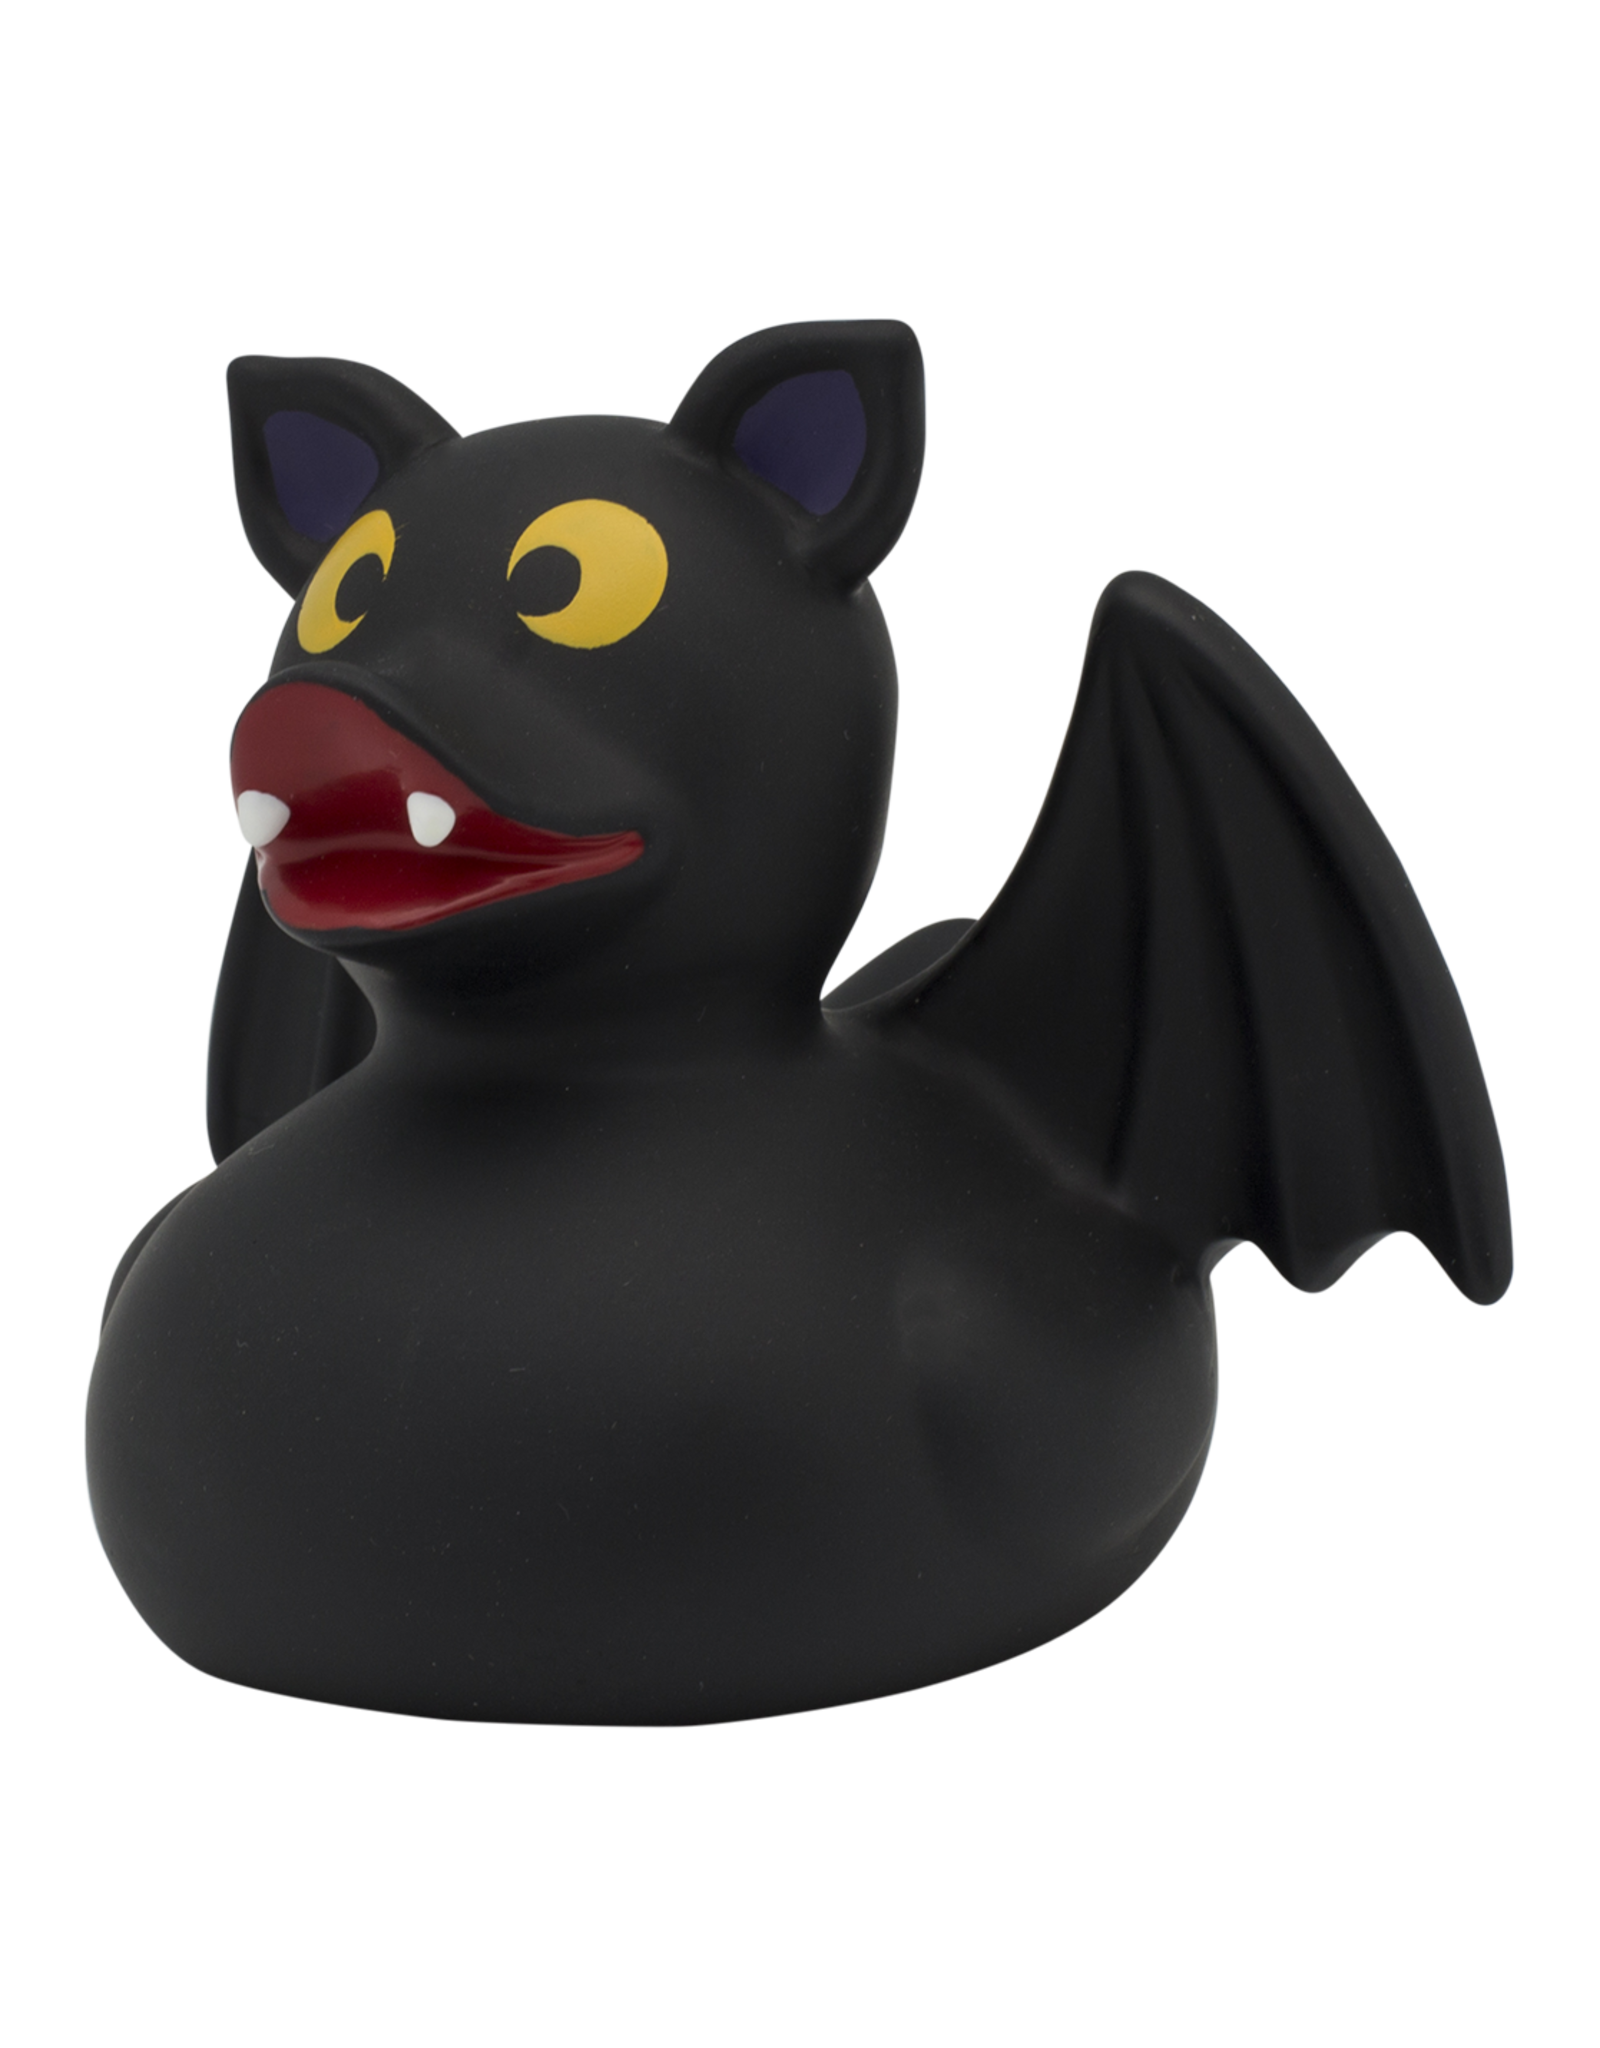 Lilalu Bat Rubber Duck